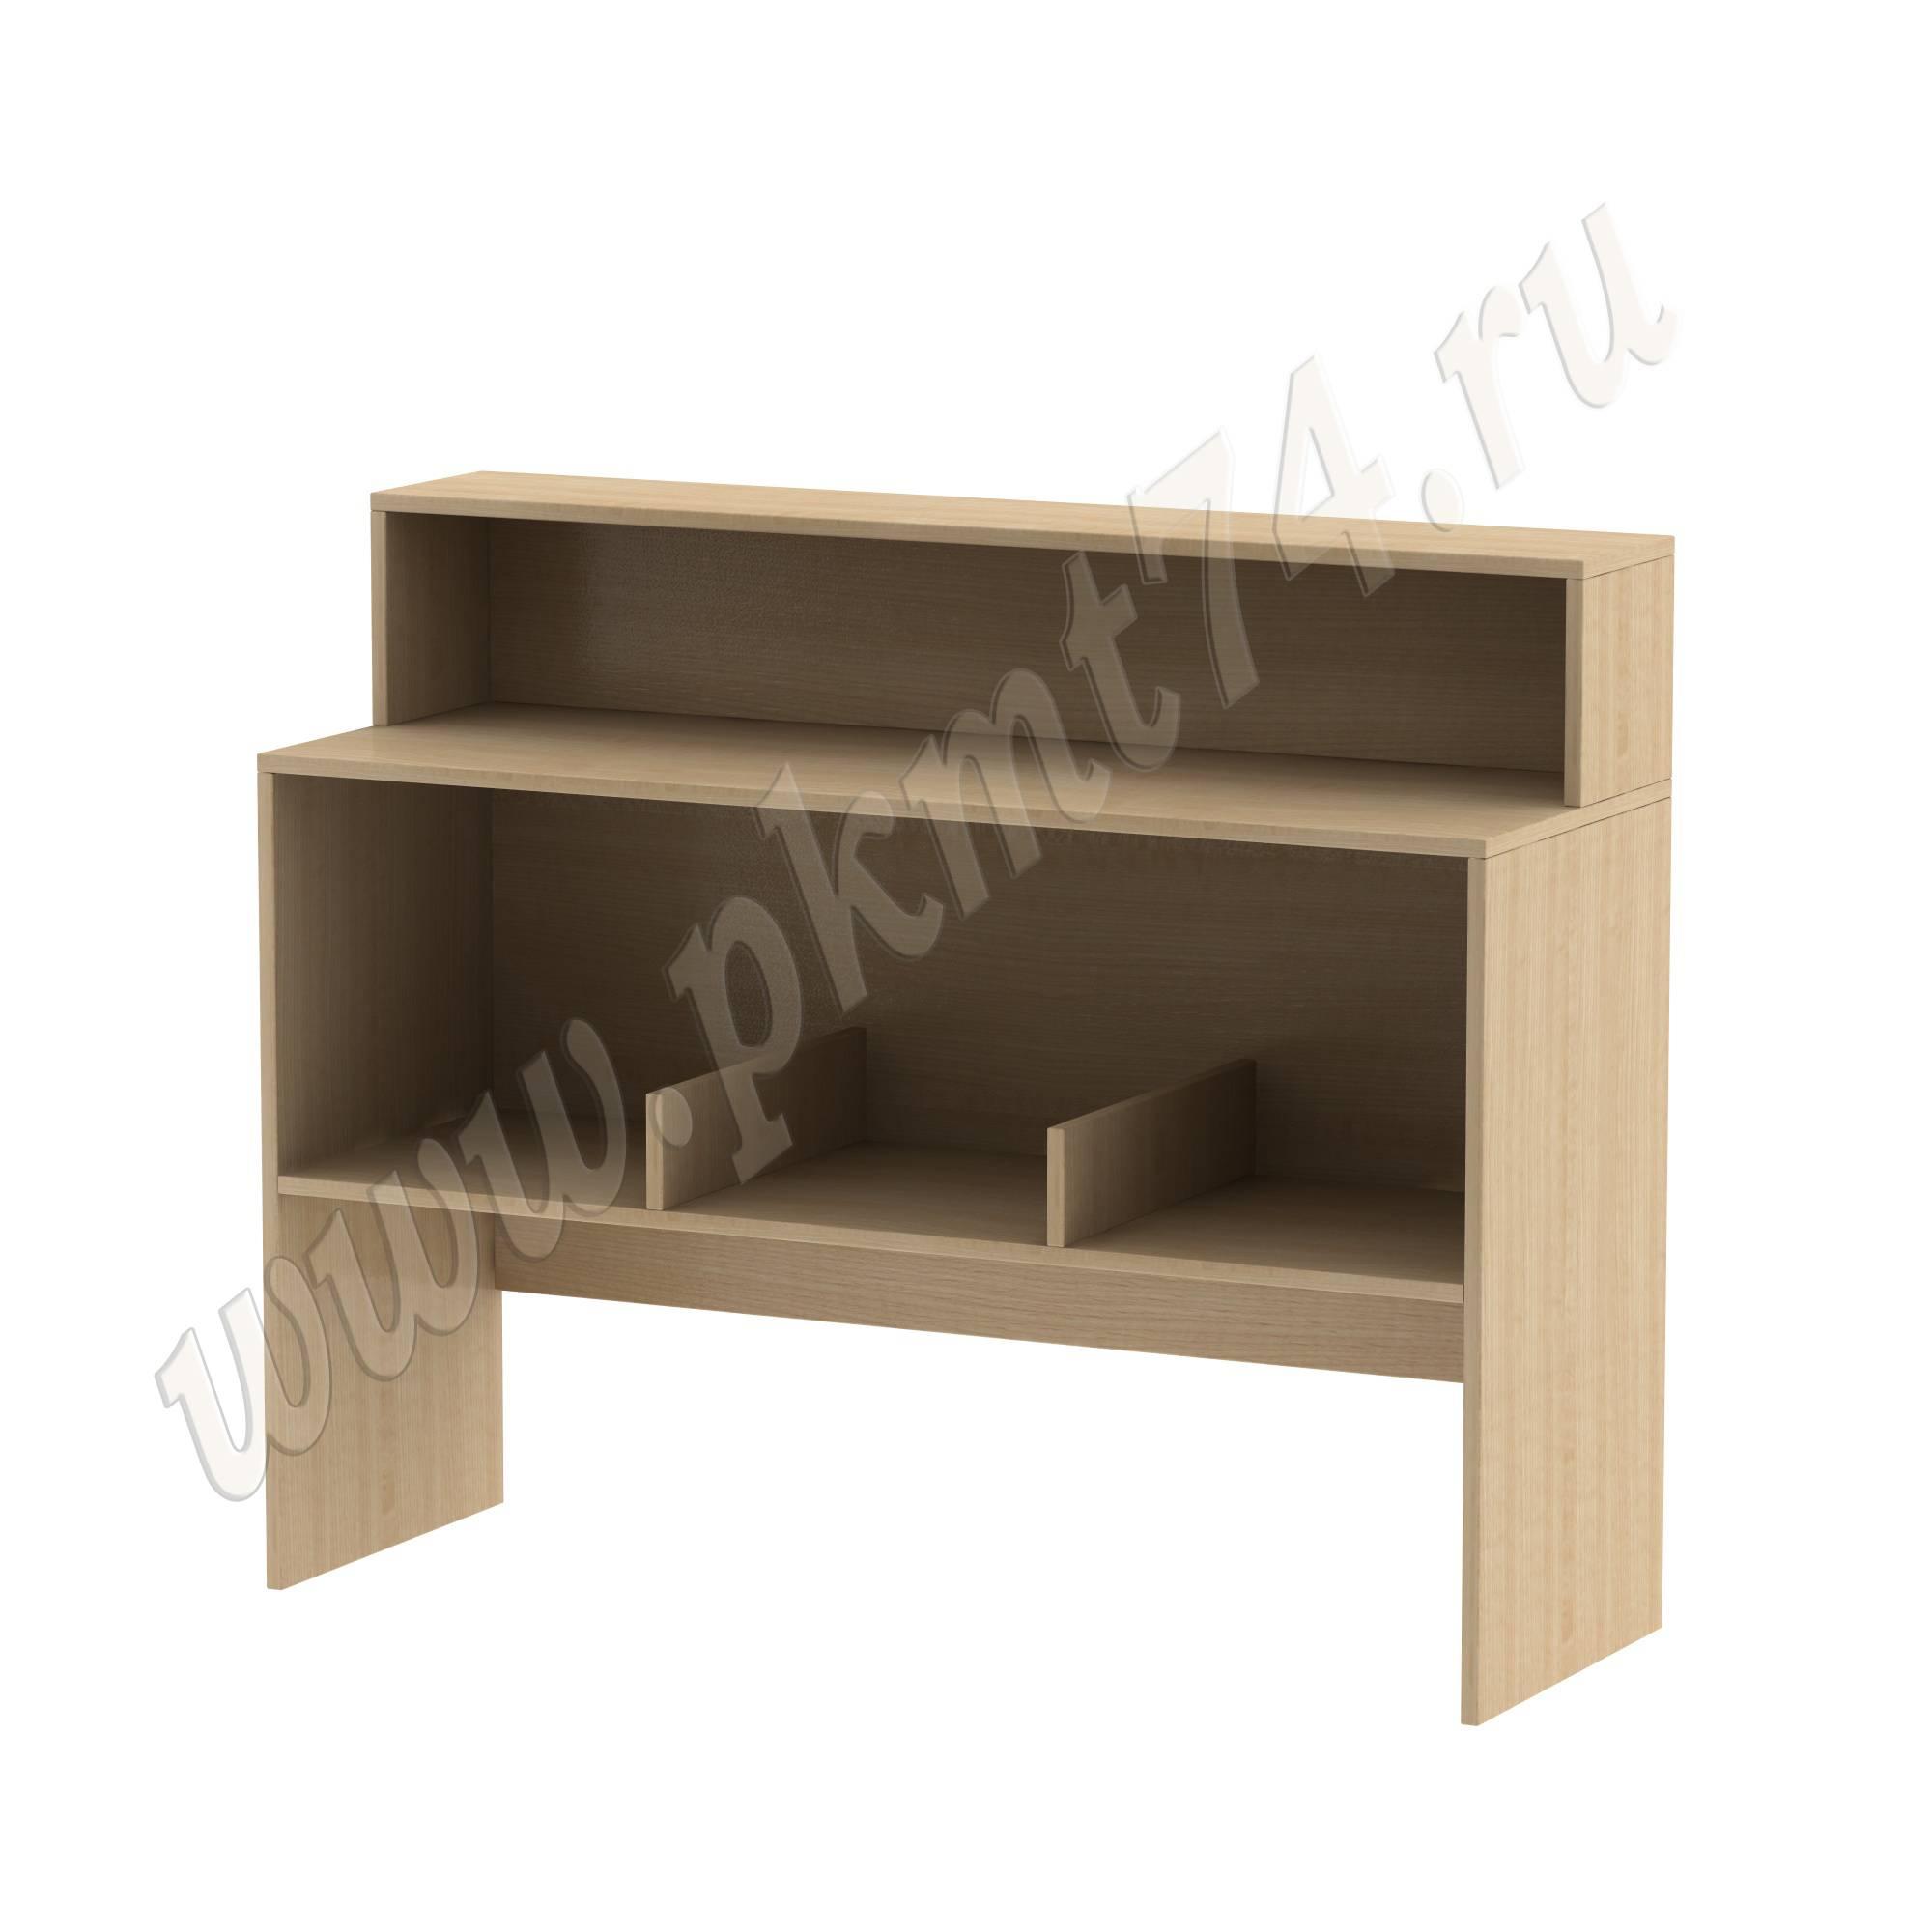 Стол барьер для выдачи книг [Цвет ЛДСП:: Клён]